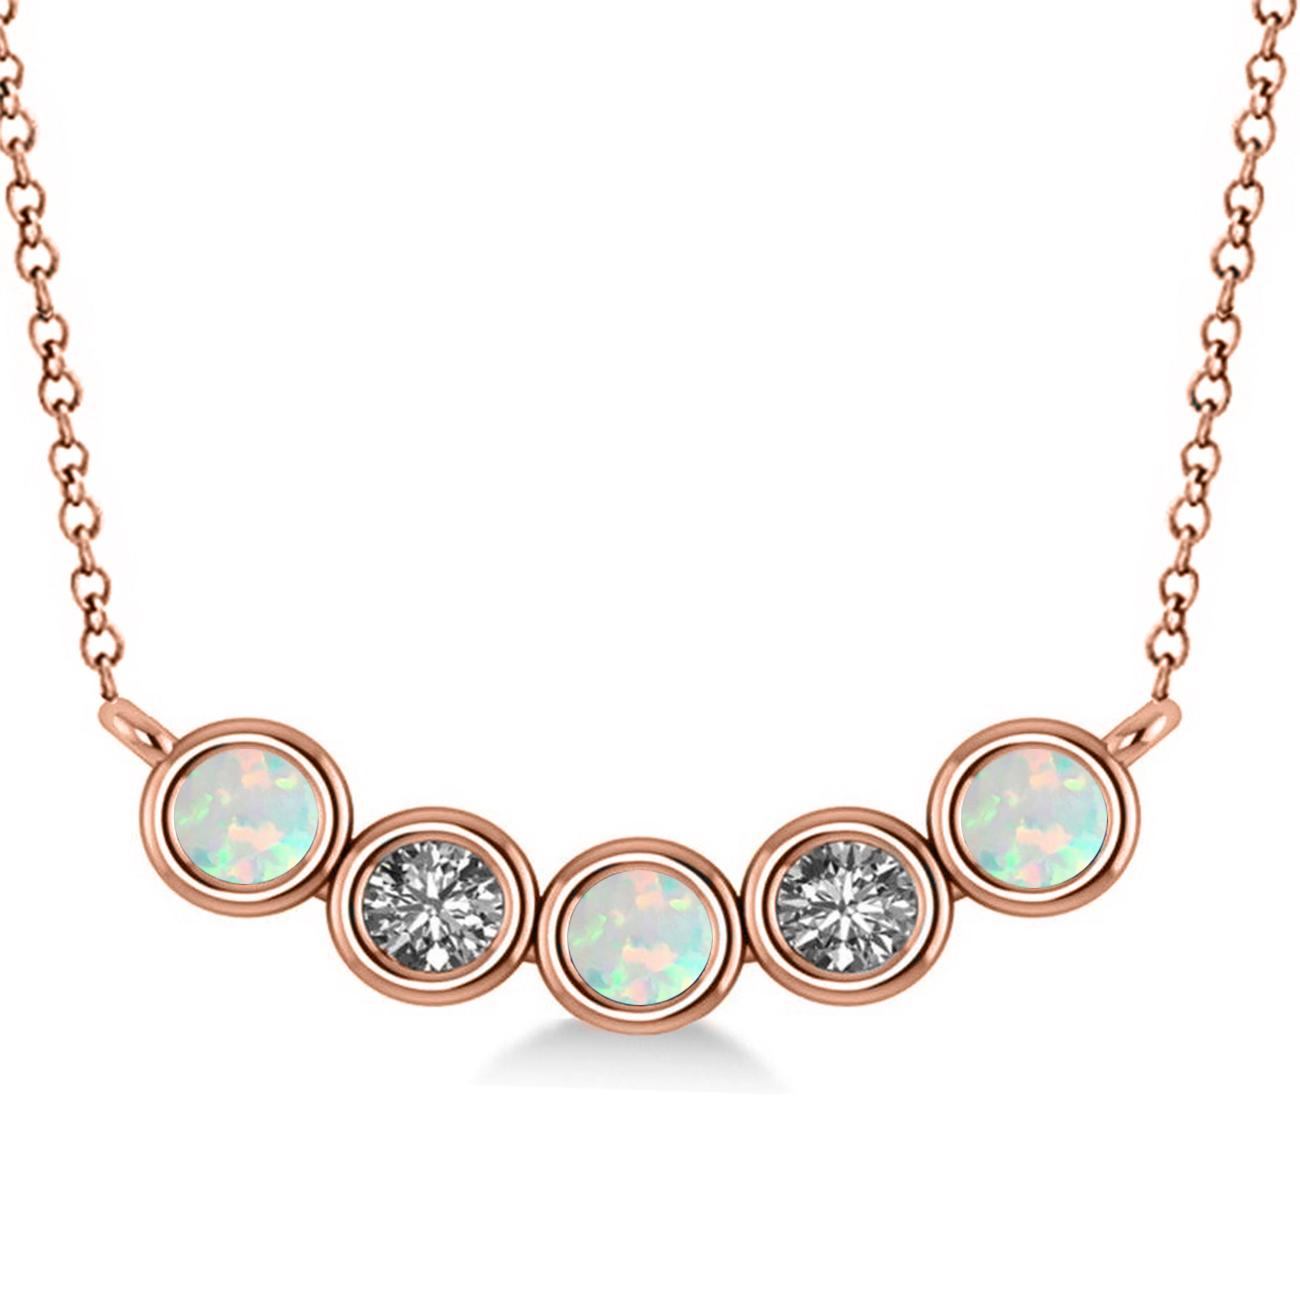 Diamond & Opal 5-Stone Pendant Necklace 14k Rose Gold 0.25ct